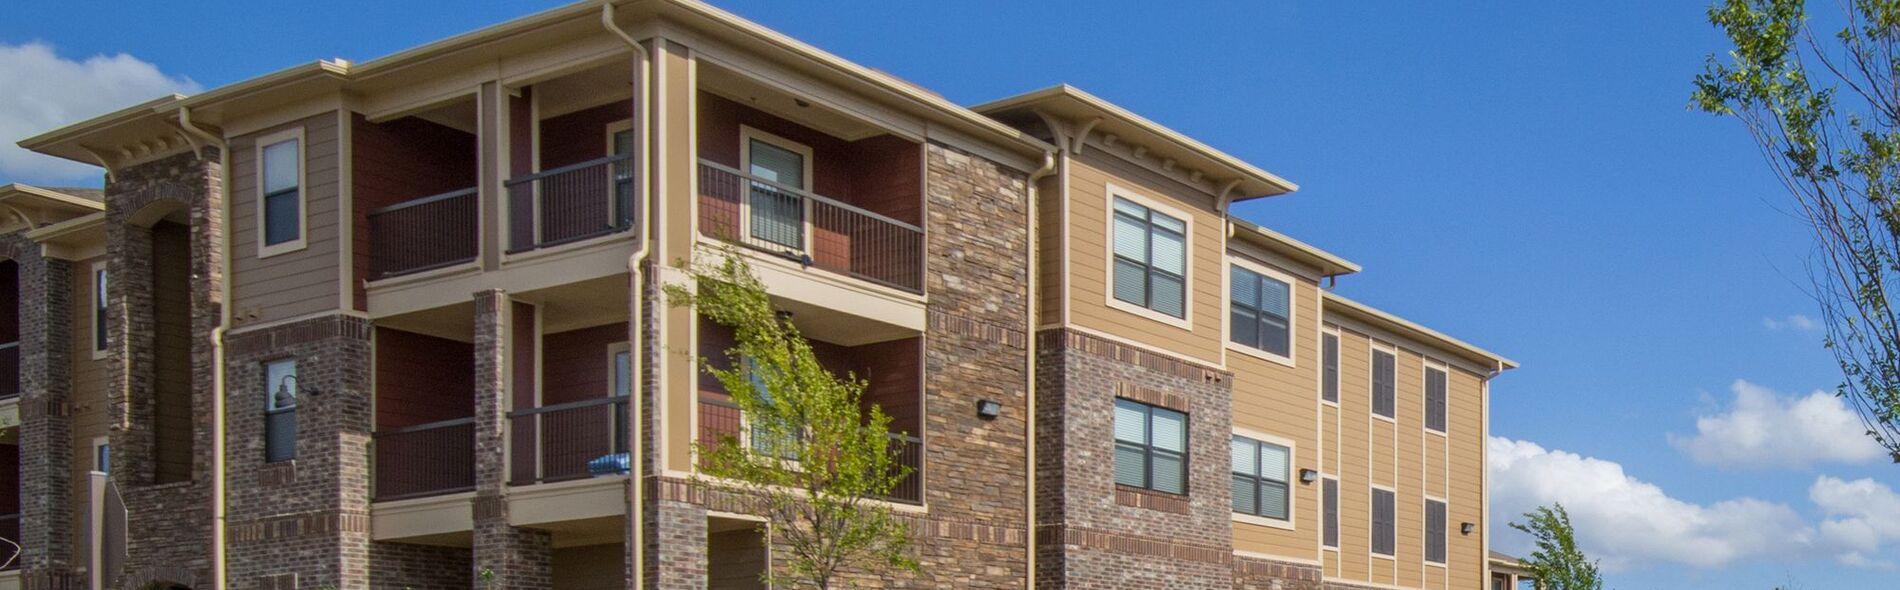 Atria Luxury Apartments 1 2 And 3 Bedroom Apartments Tulsa Ok